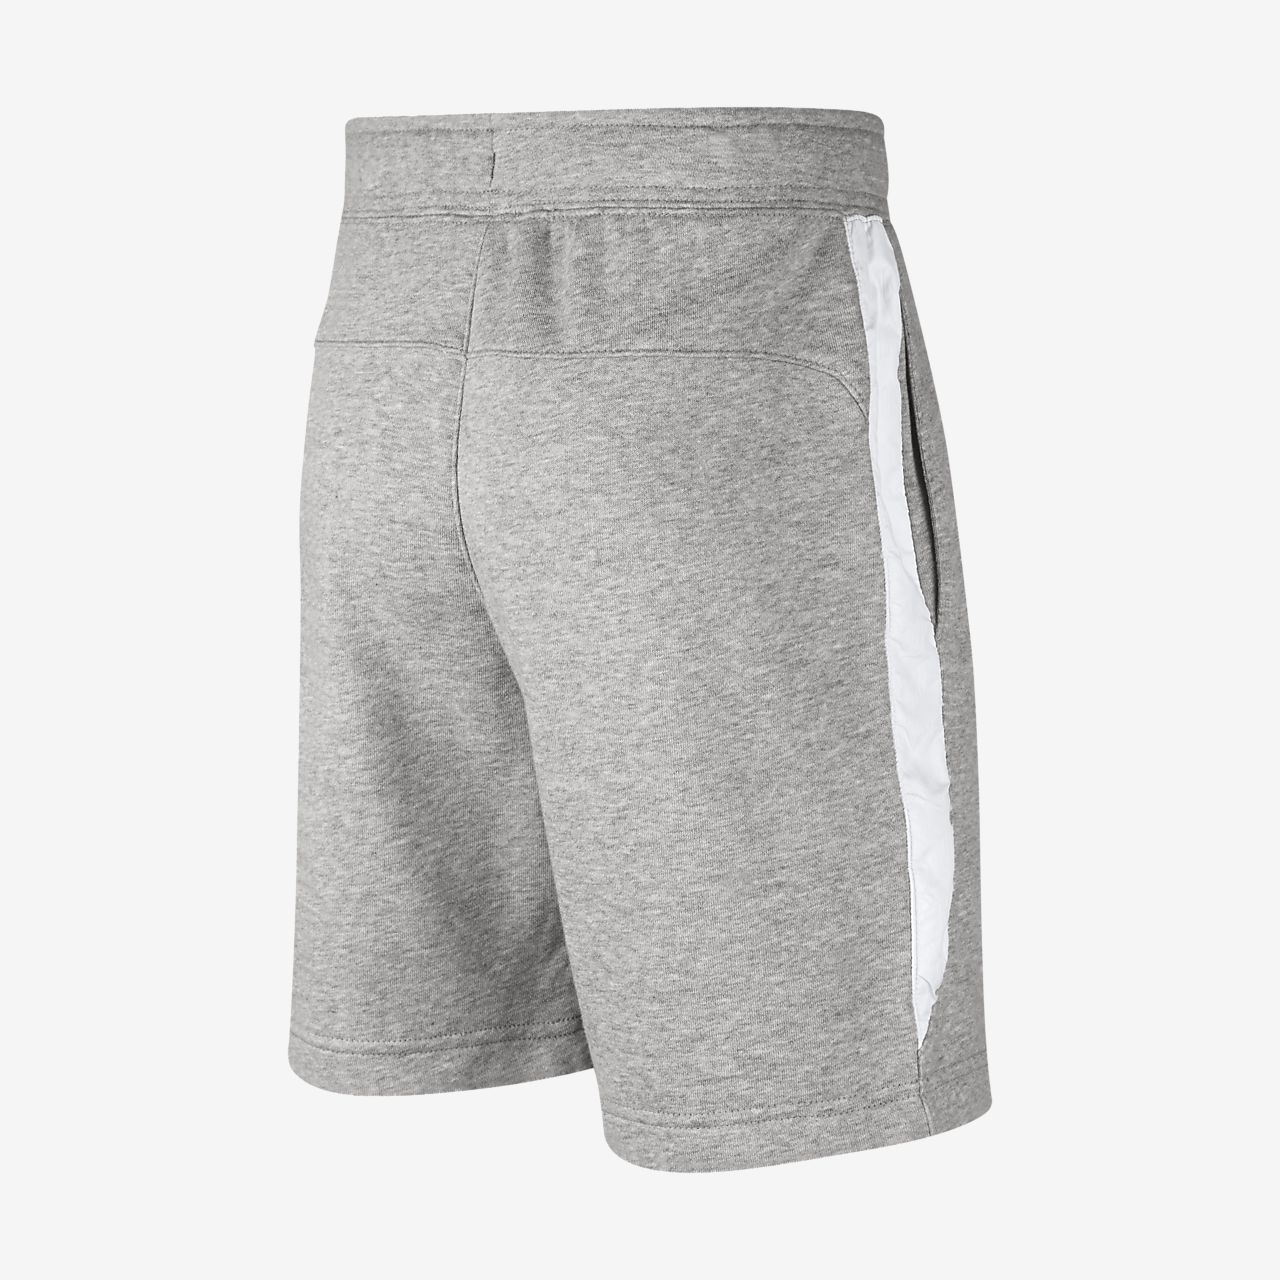 9af82c17962 Shorts para niño talla grande Nike Sportswear. Nike.com MX